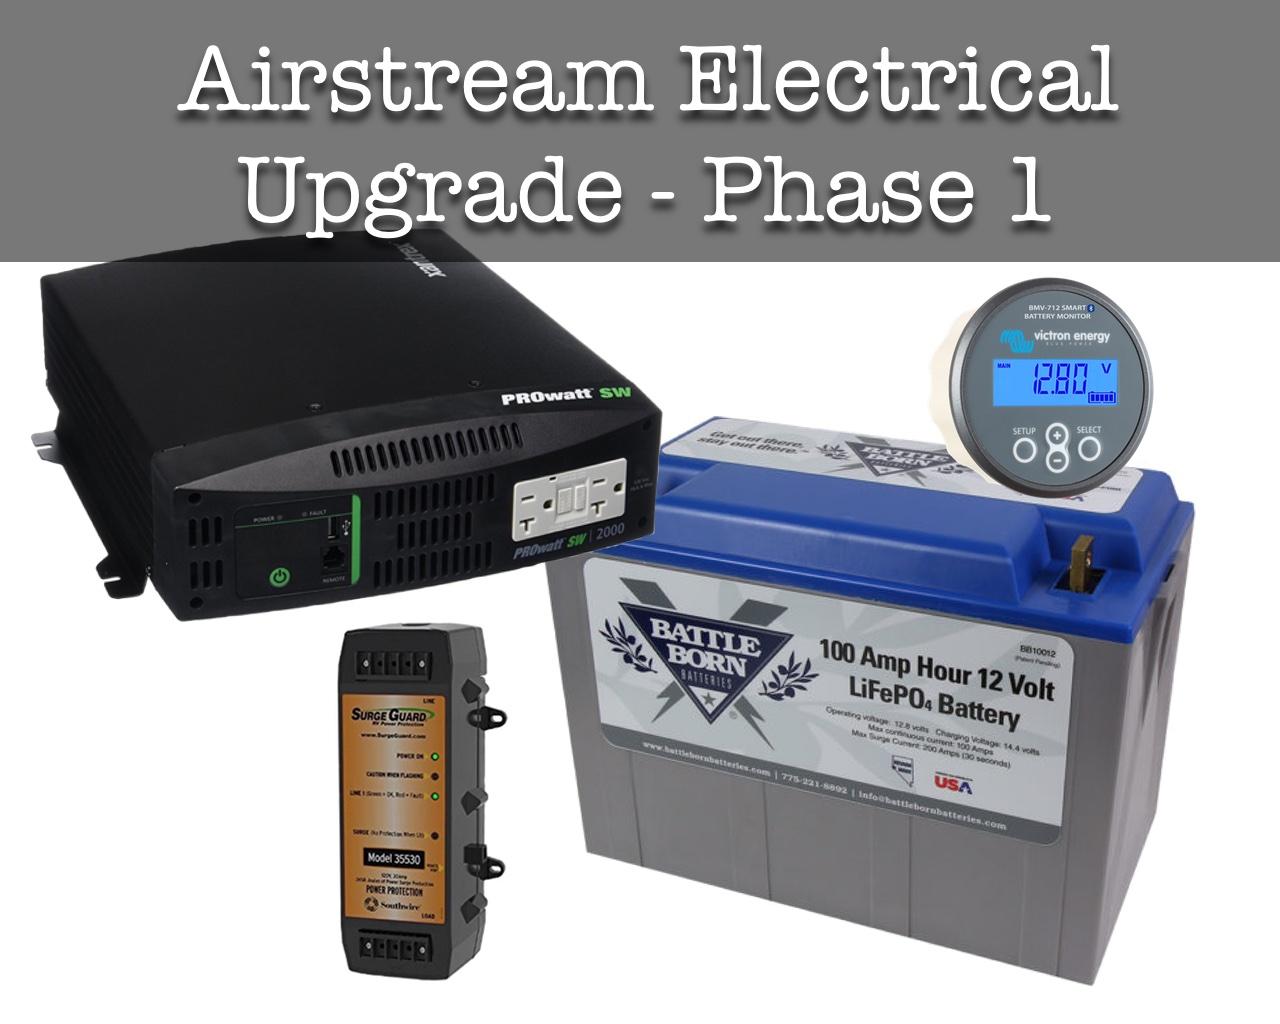 Airstream Electrical System Upgrade Phase I Wacky Wanderersrhwackywanderers: Airstream Tv Wiring Diagram At Gmaili.net